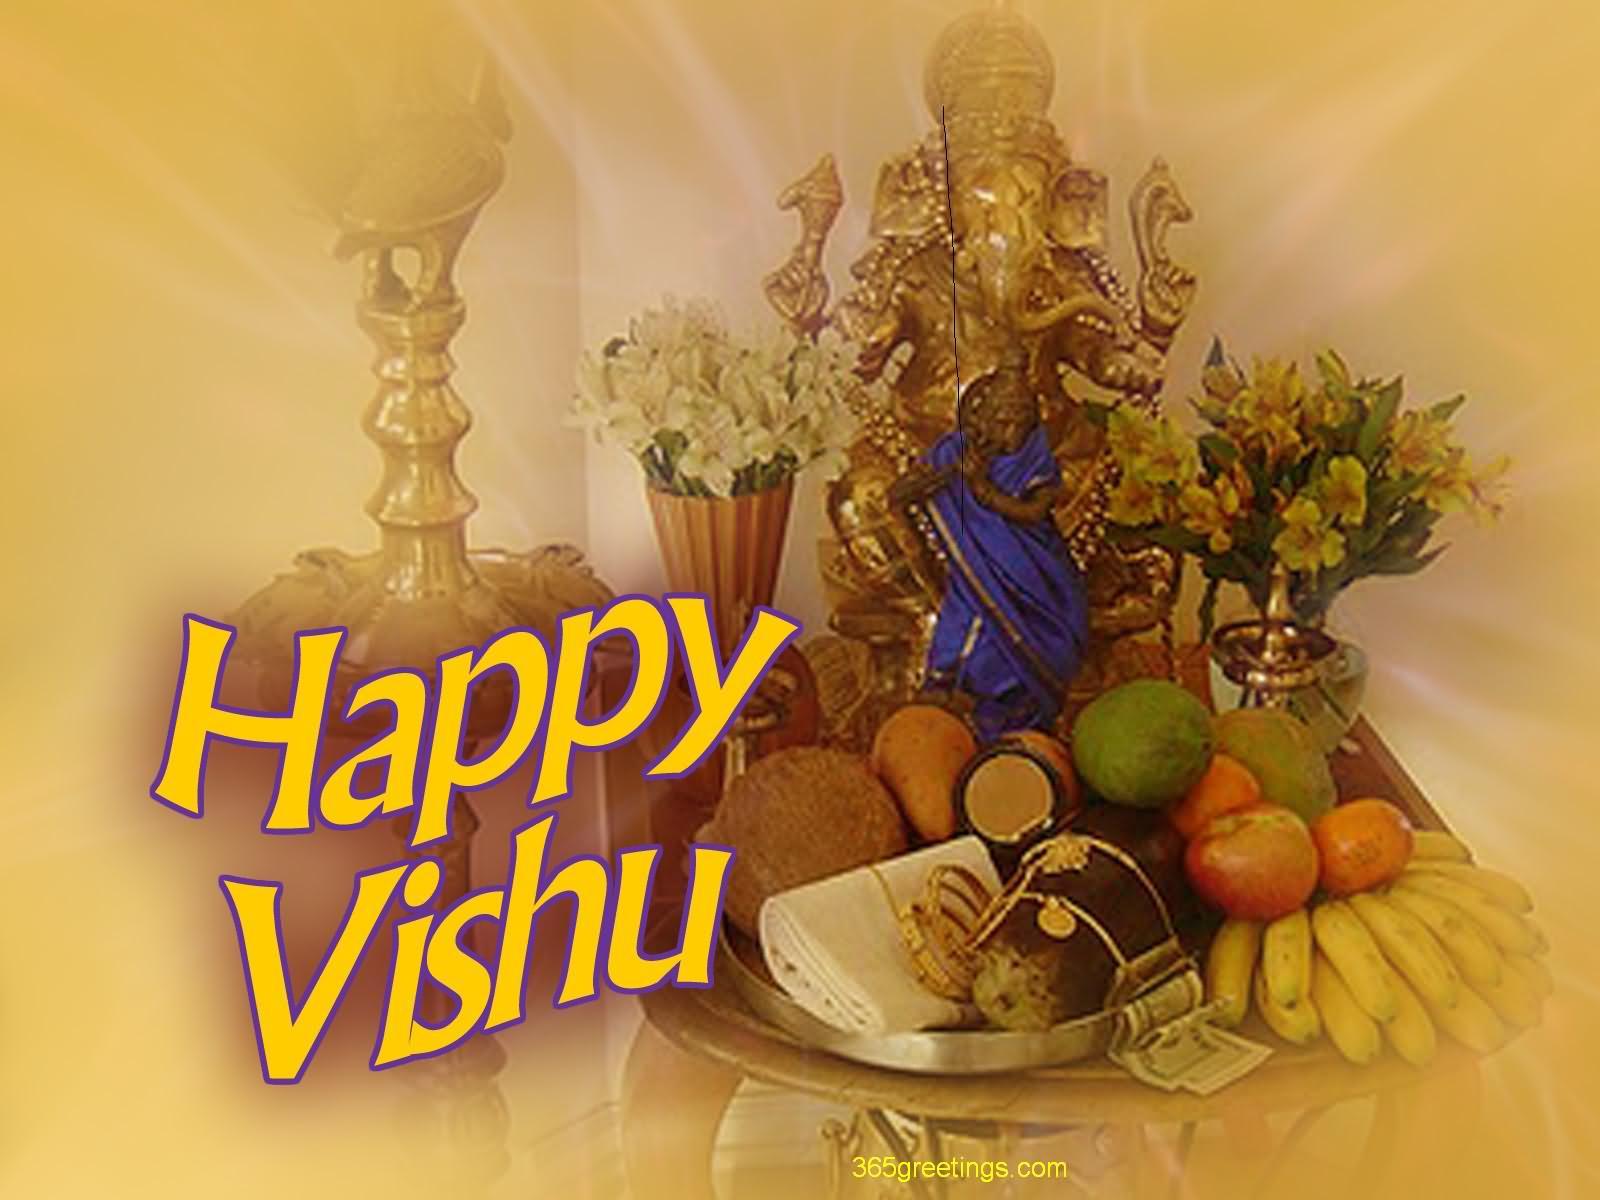 Vishu Hd Wallpapers 35 Very Beautiful Vishu Wallpaper Images And Pictures